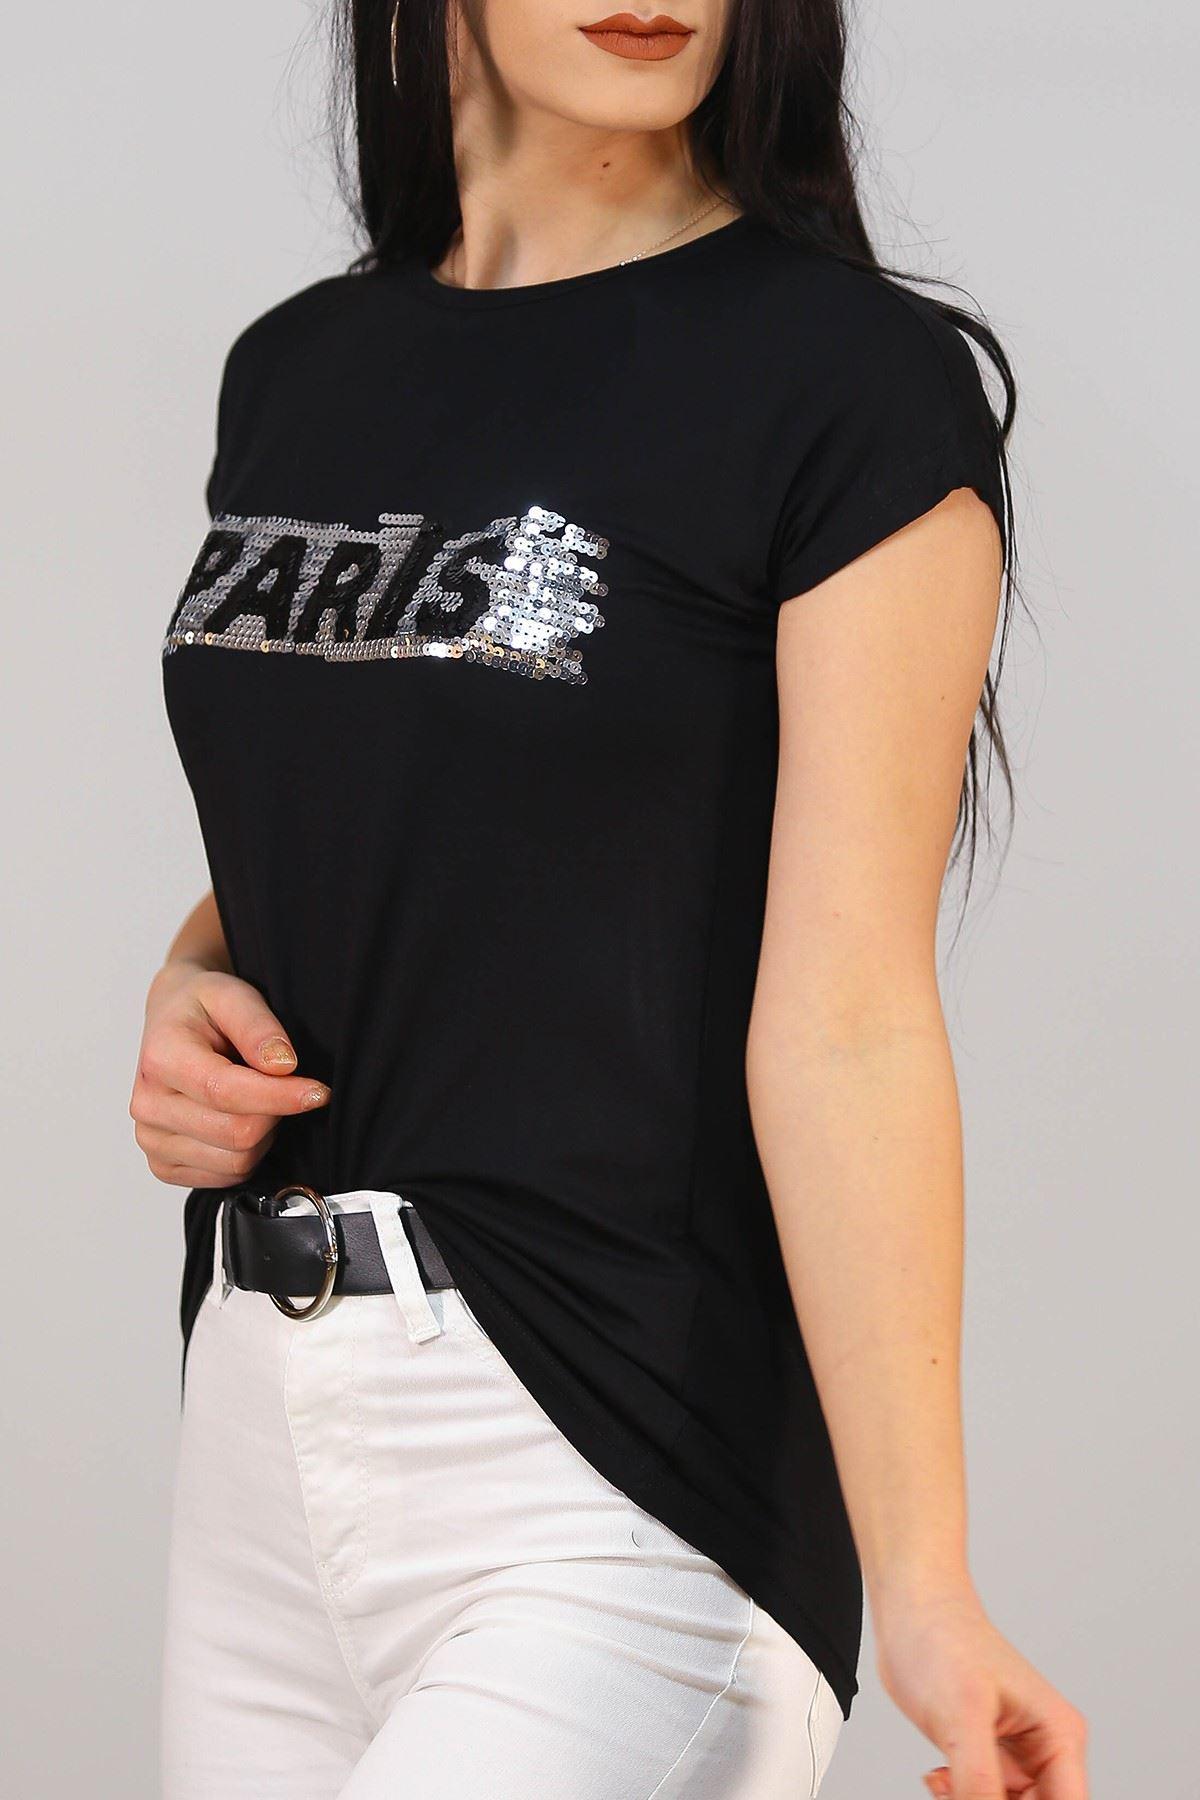 Paris Baskı Tişört Siyah - 5051.139.